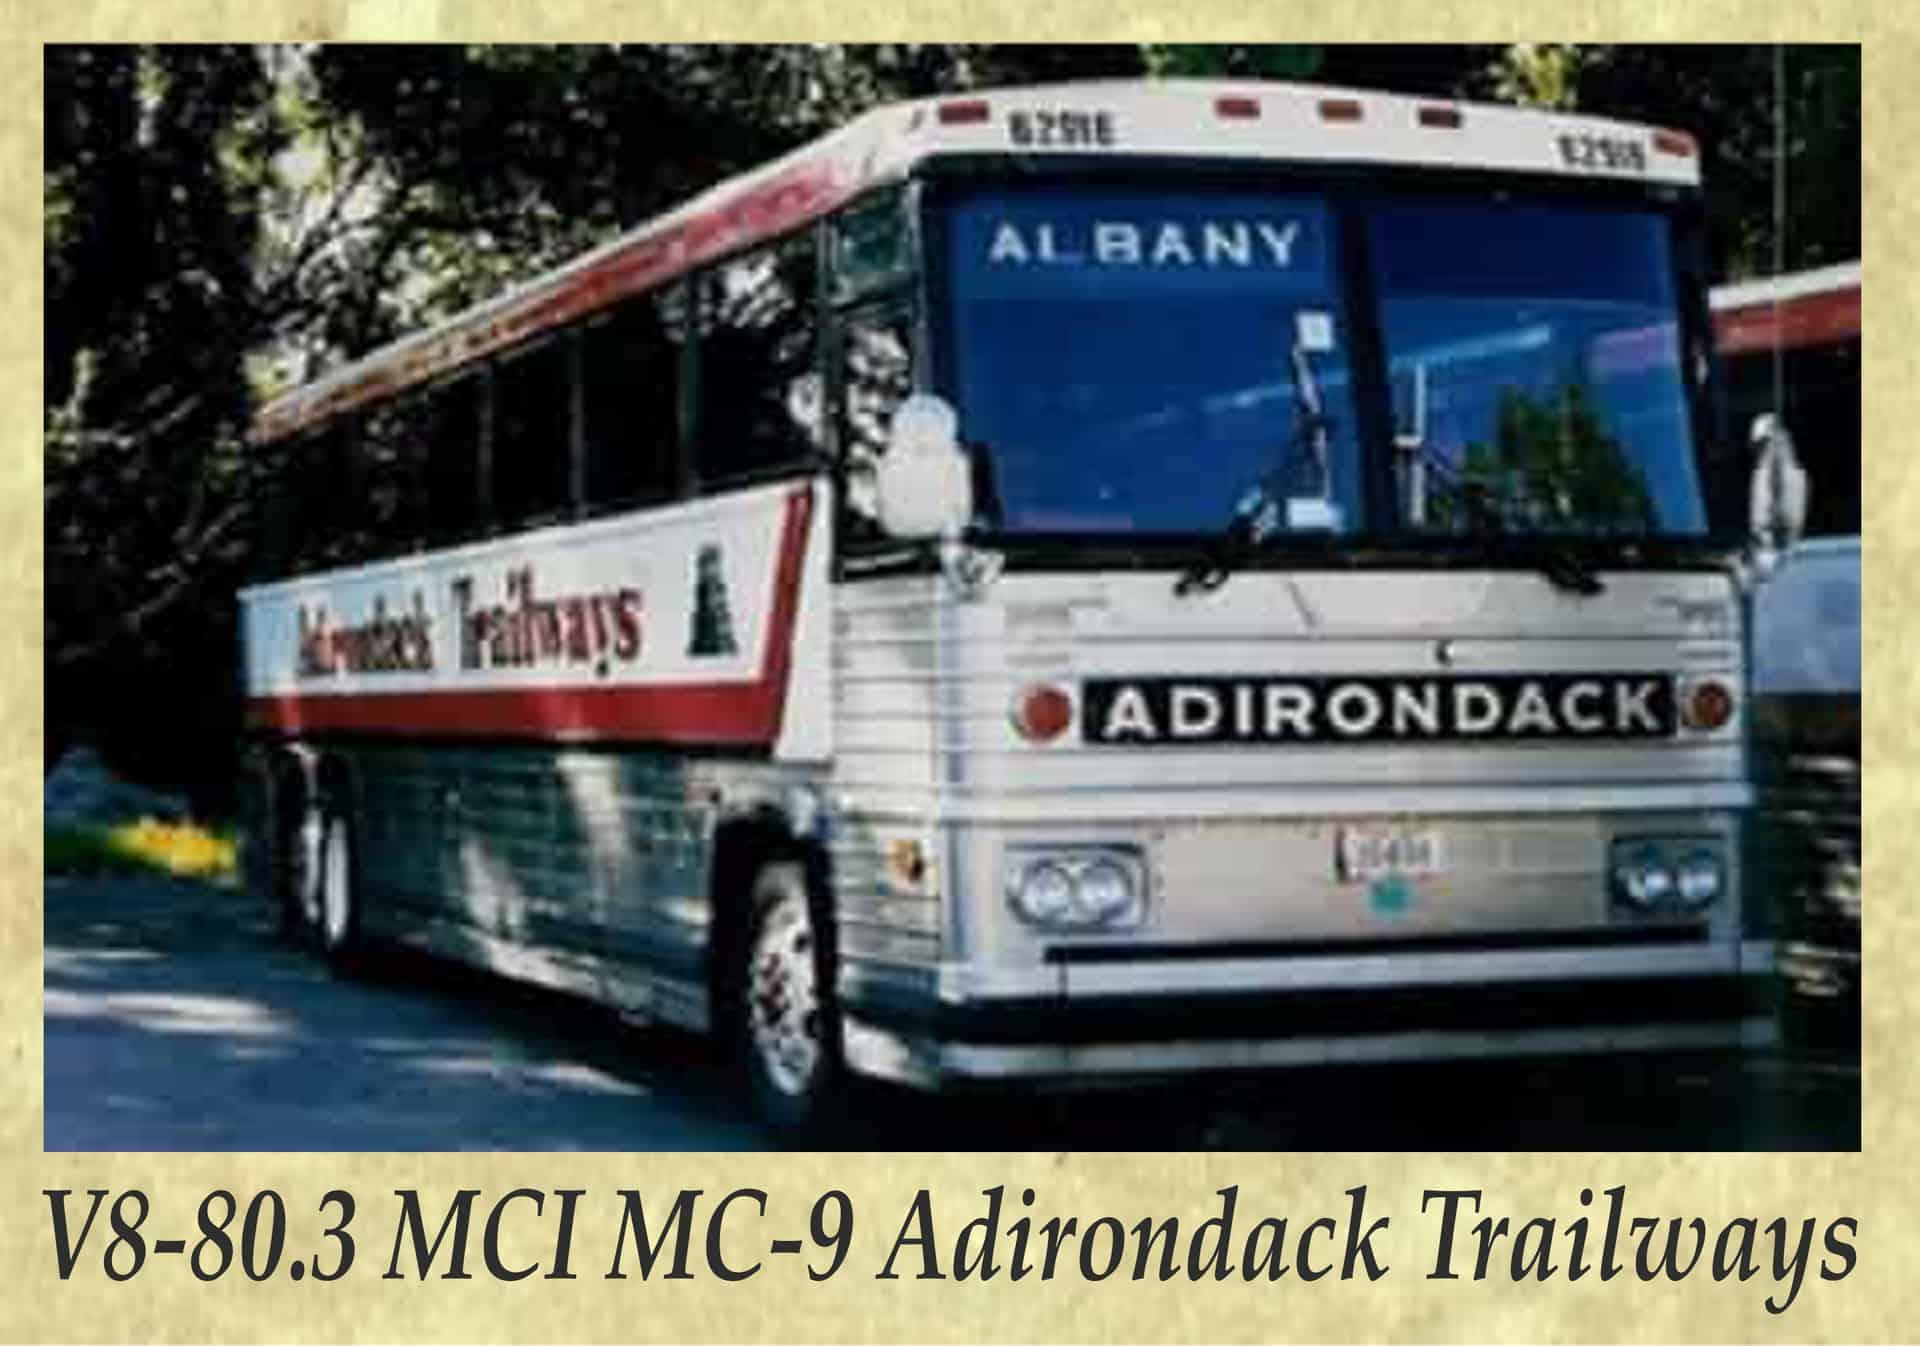 V8-80.3 MCI MC-9 Adirondack Trailways